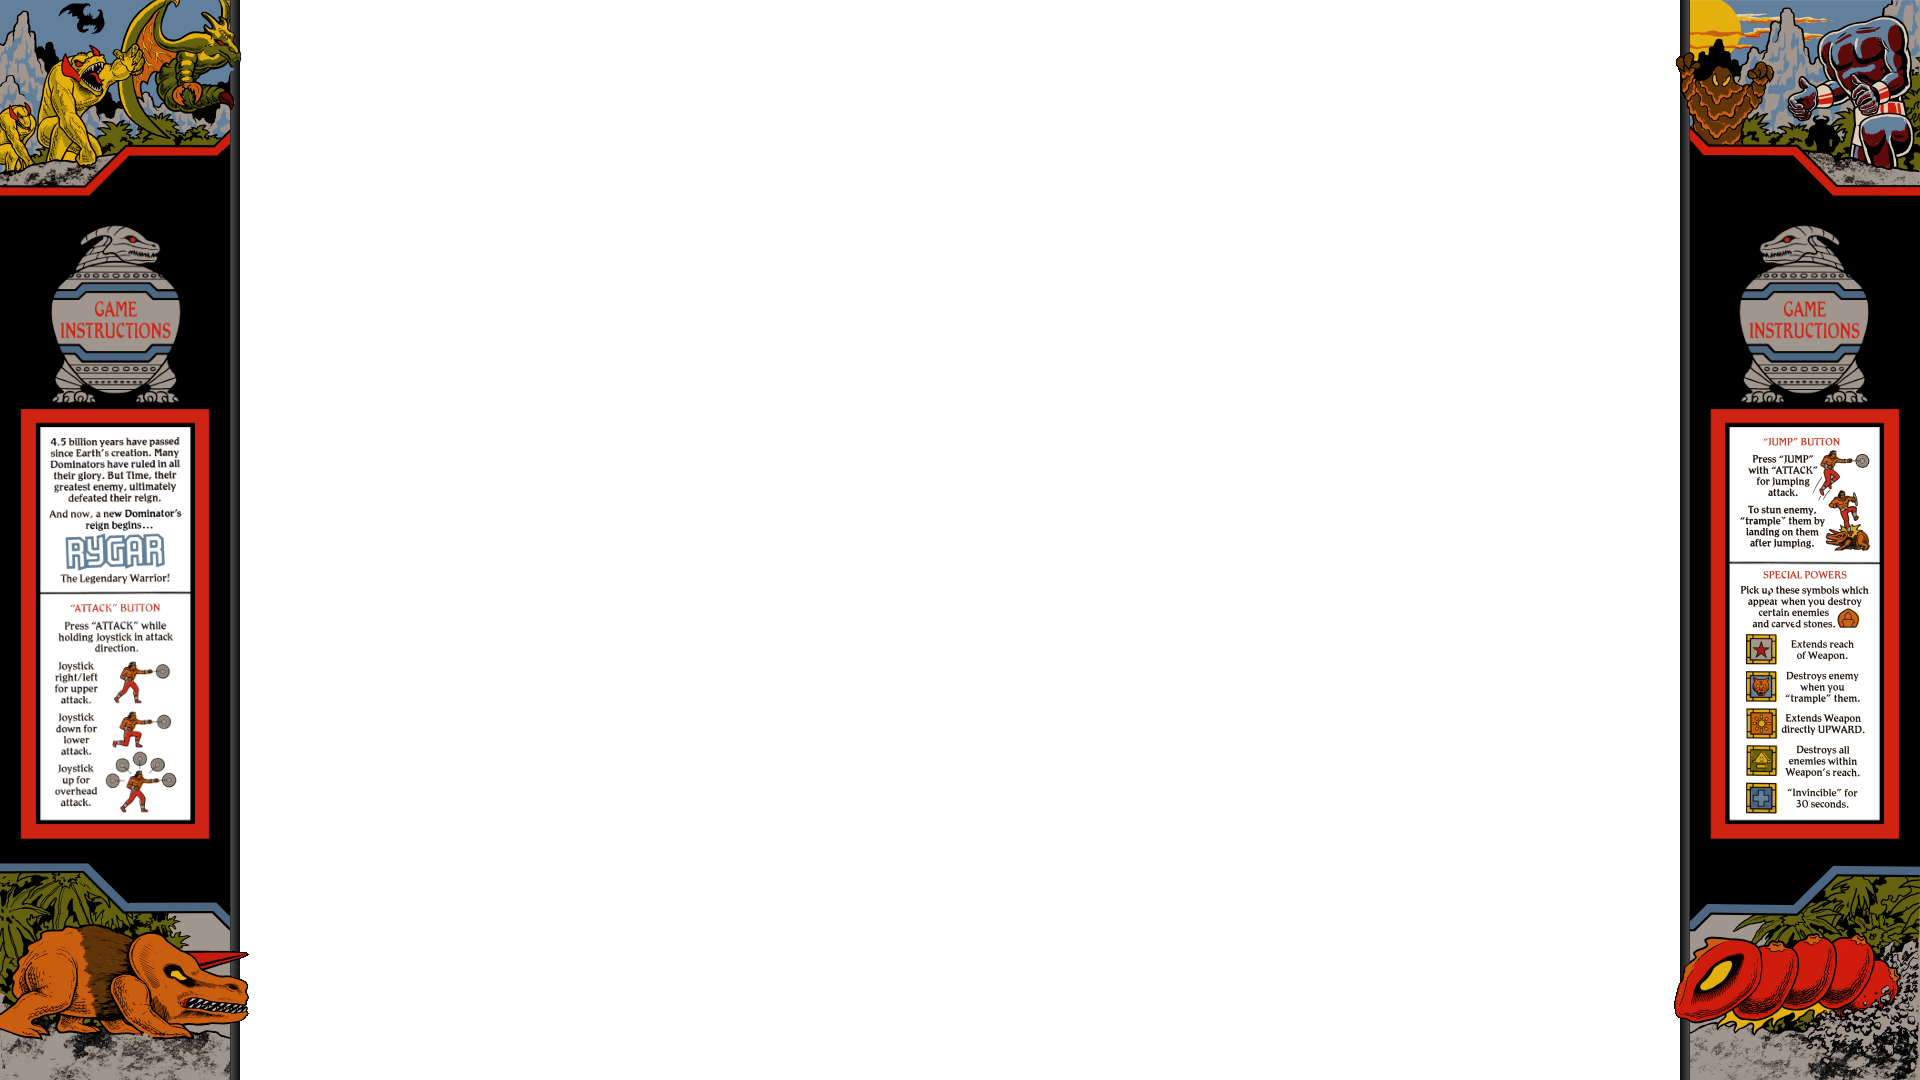 Rygar overlay